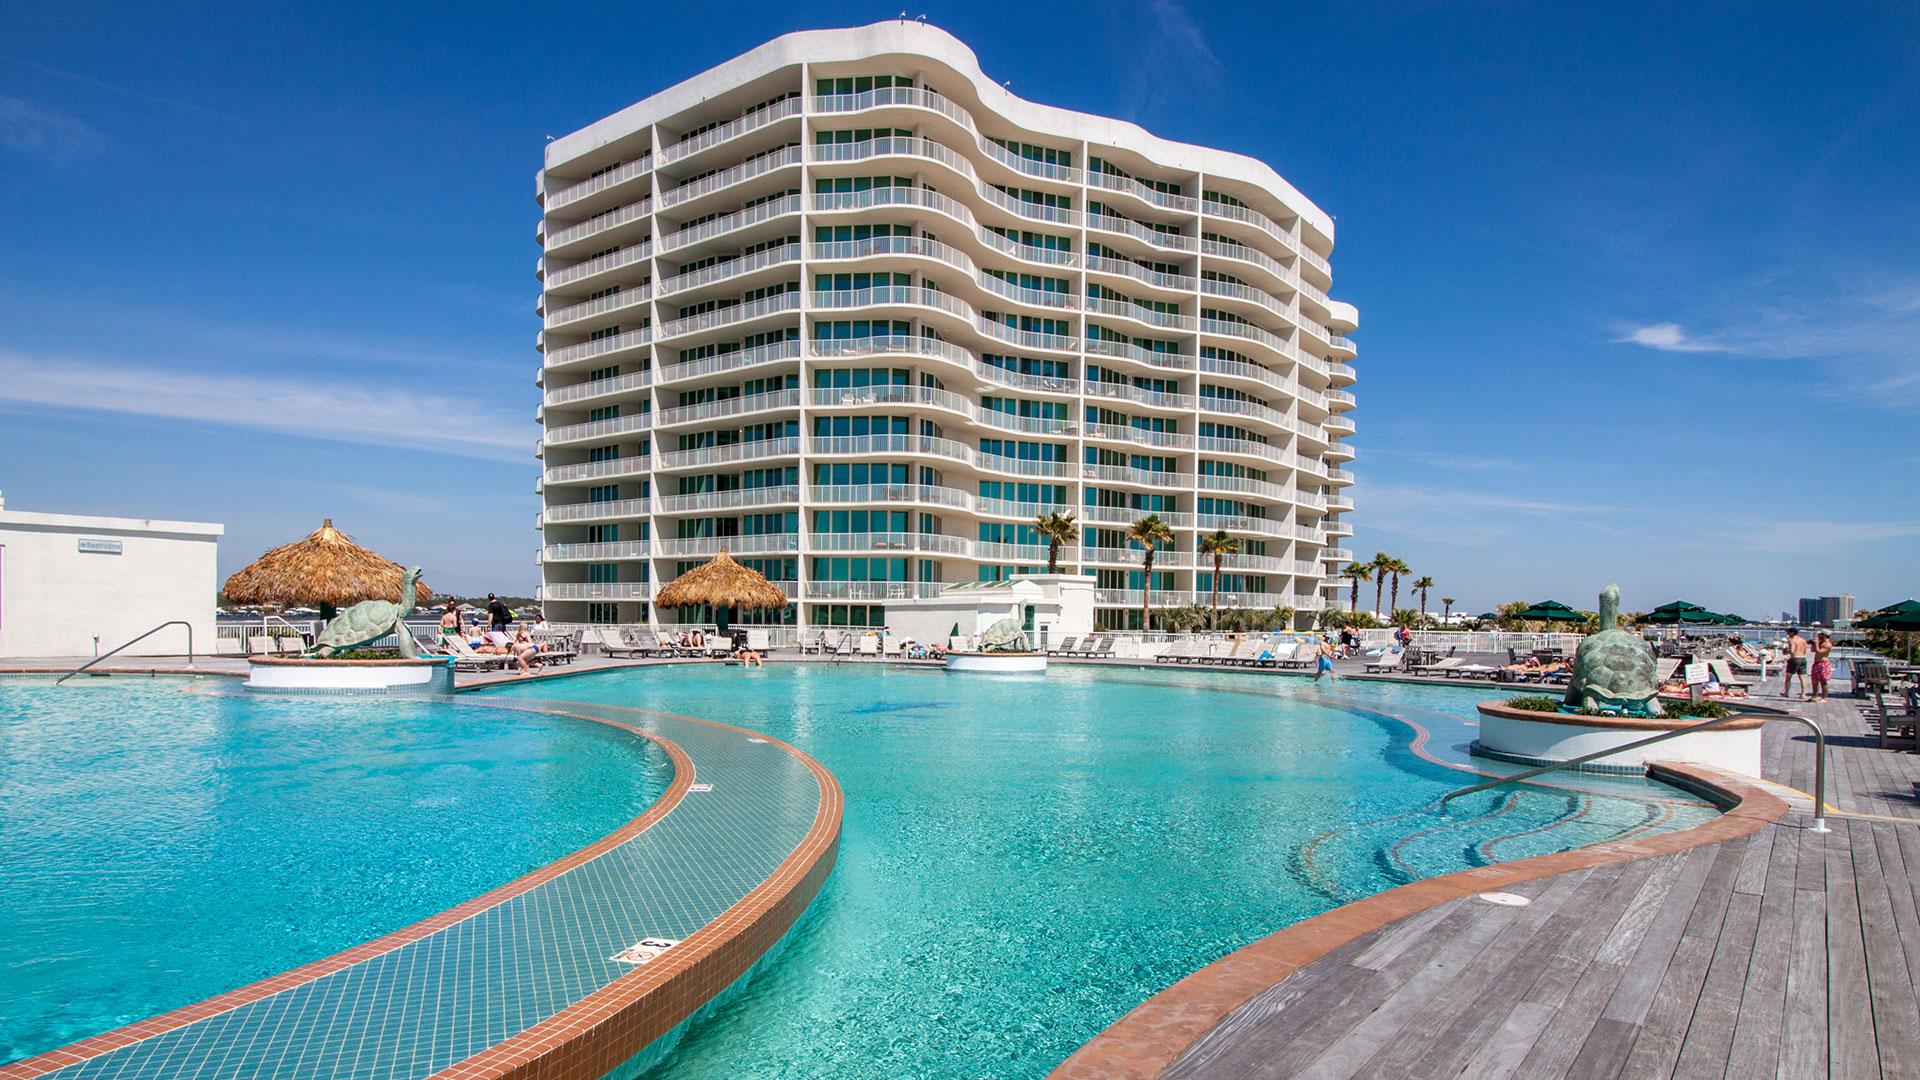 Caribe Resort Pool